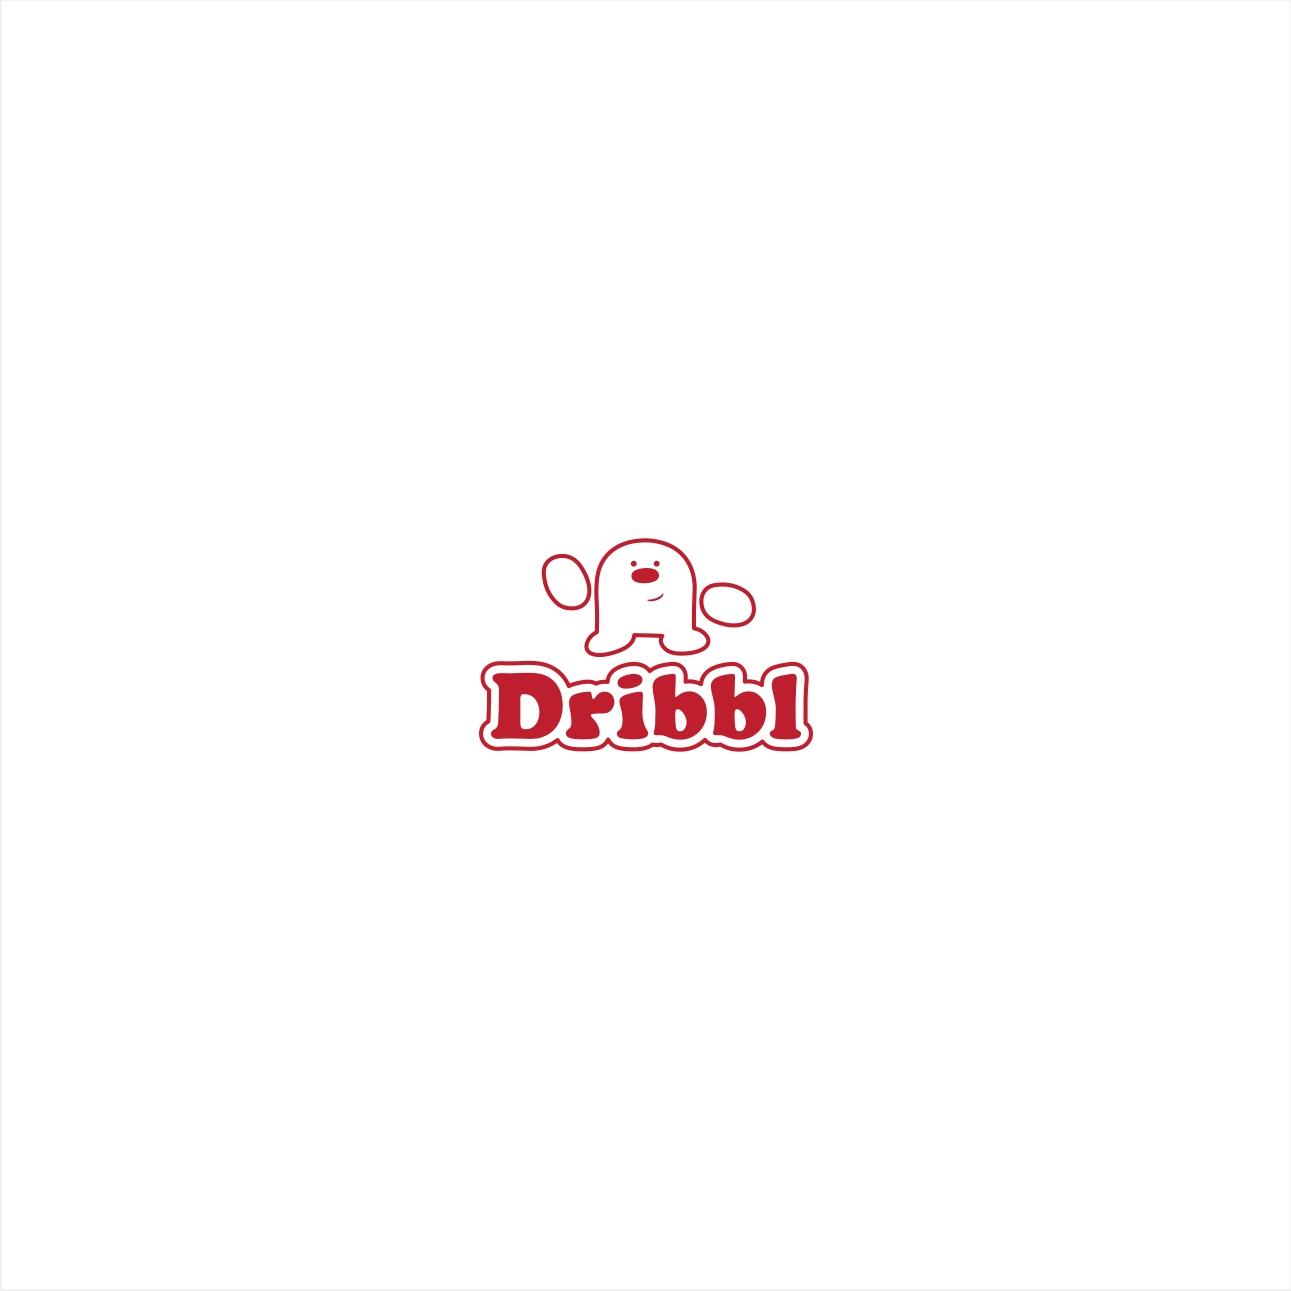 Разработка логотипа для сайта Dribbl.ru фото f_9975aa0286734cdb.jpg